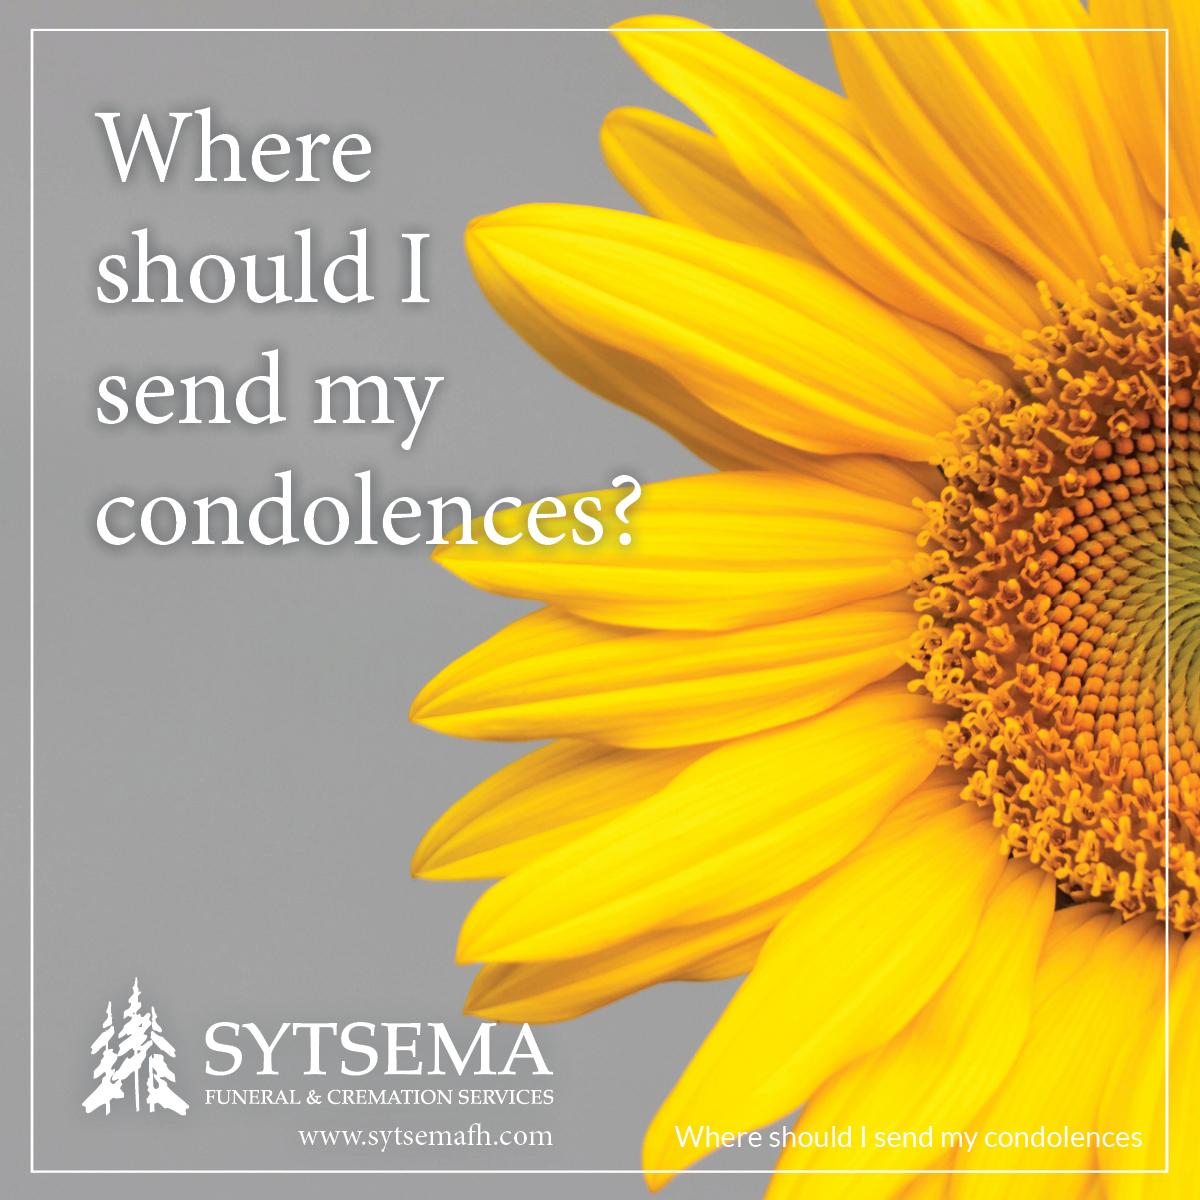 Where should I send my condolences?